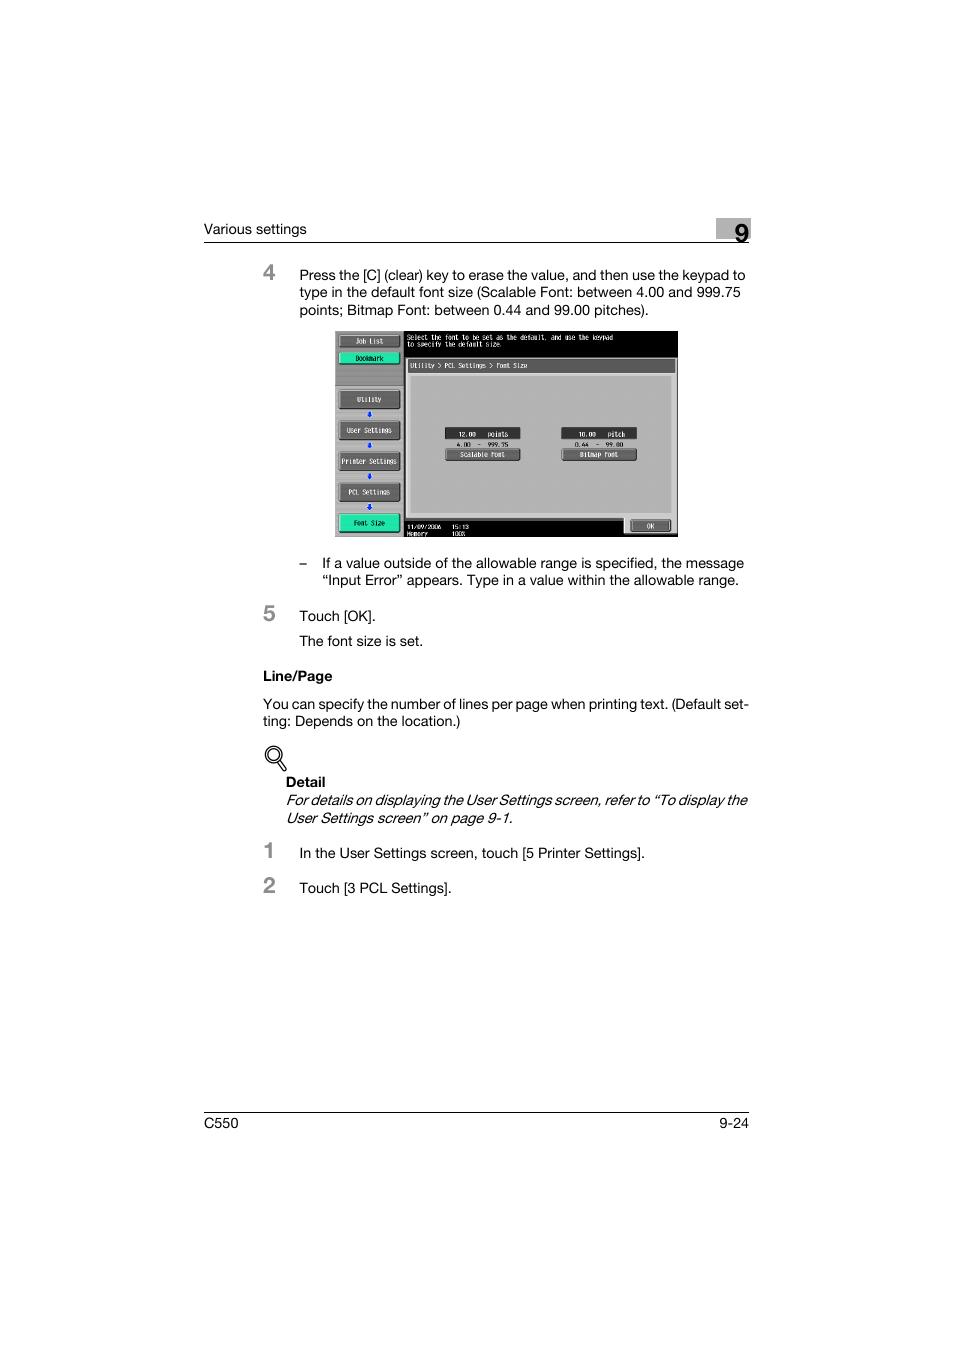 konica minolta bizhub c550 user manual page 333 400 original mode rh manualsdir com bizhub c550 service manual bizhub c550 service manual pdf